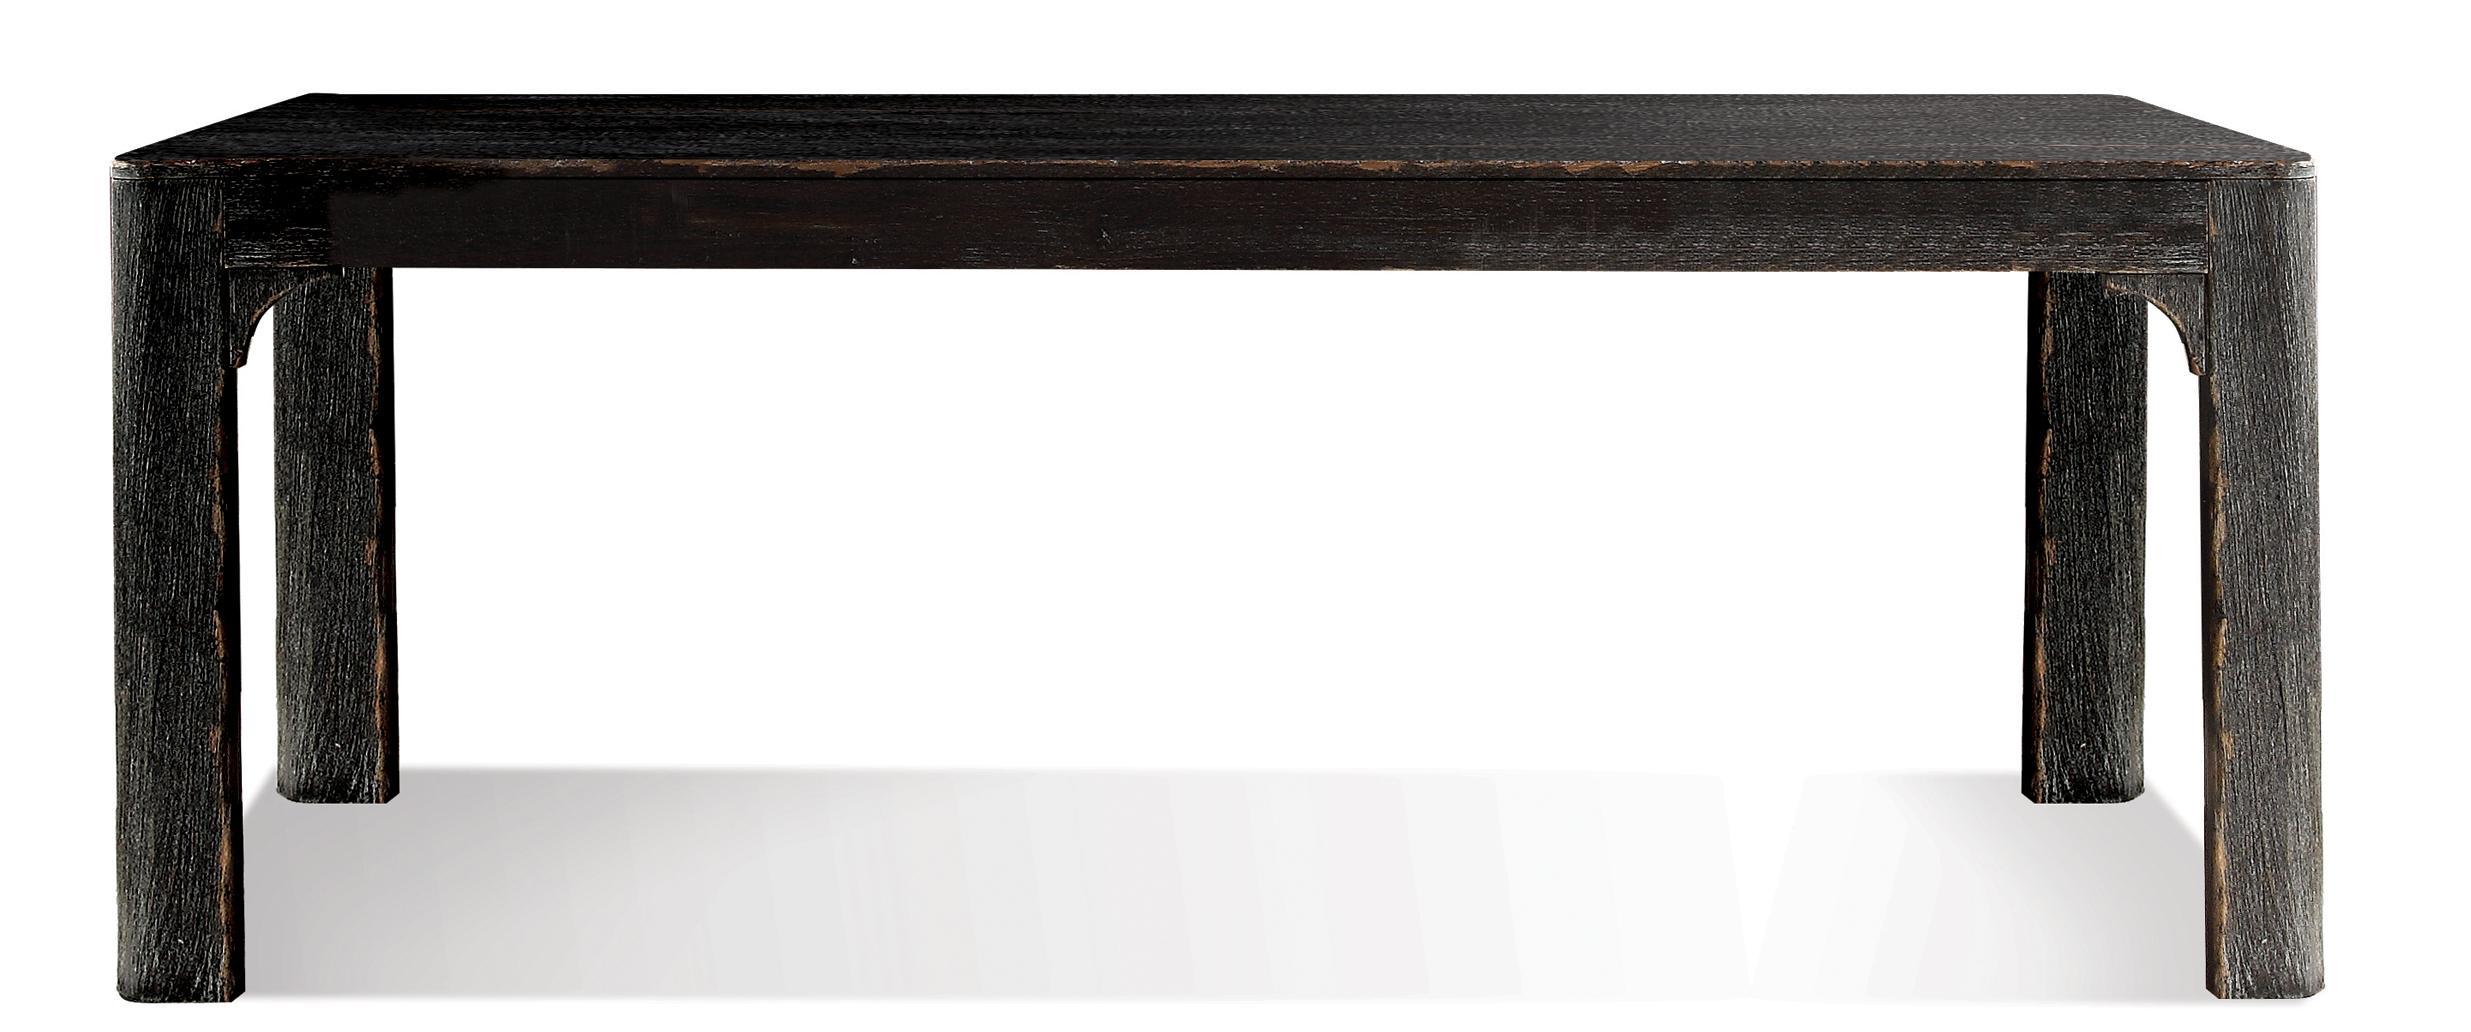 Riverside Furniture Bellagio 76- Inch Dining Table - Item Number: 11850